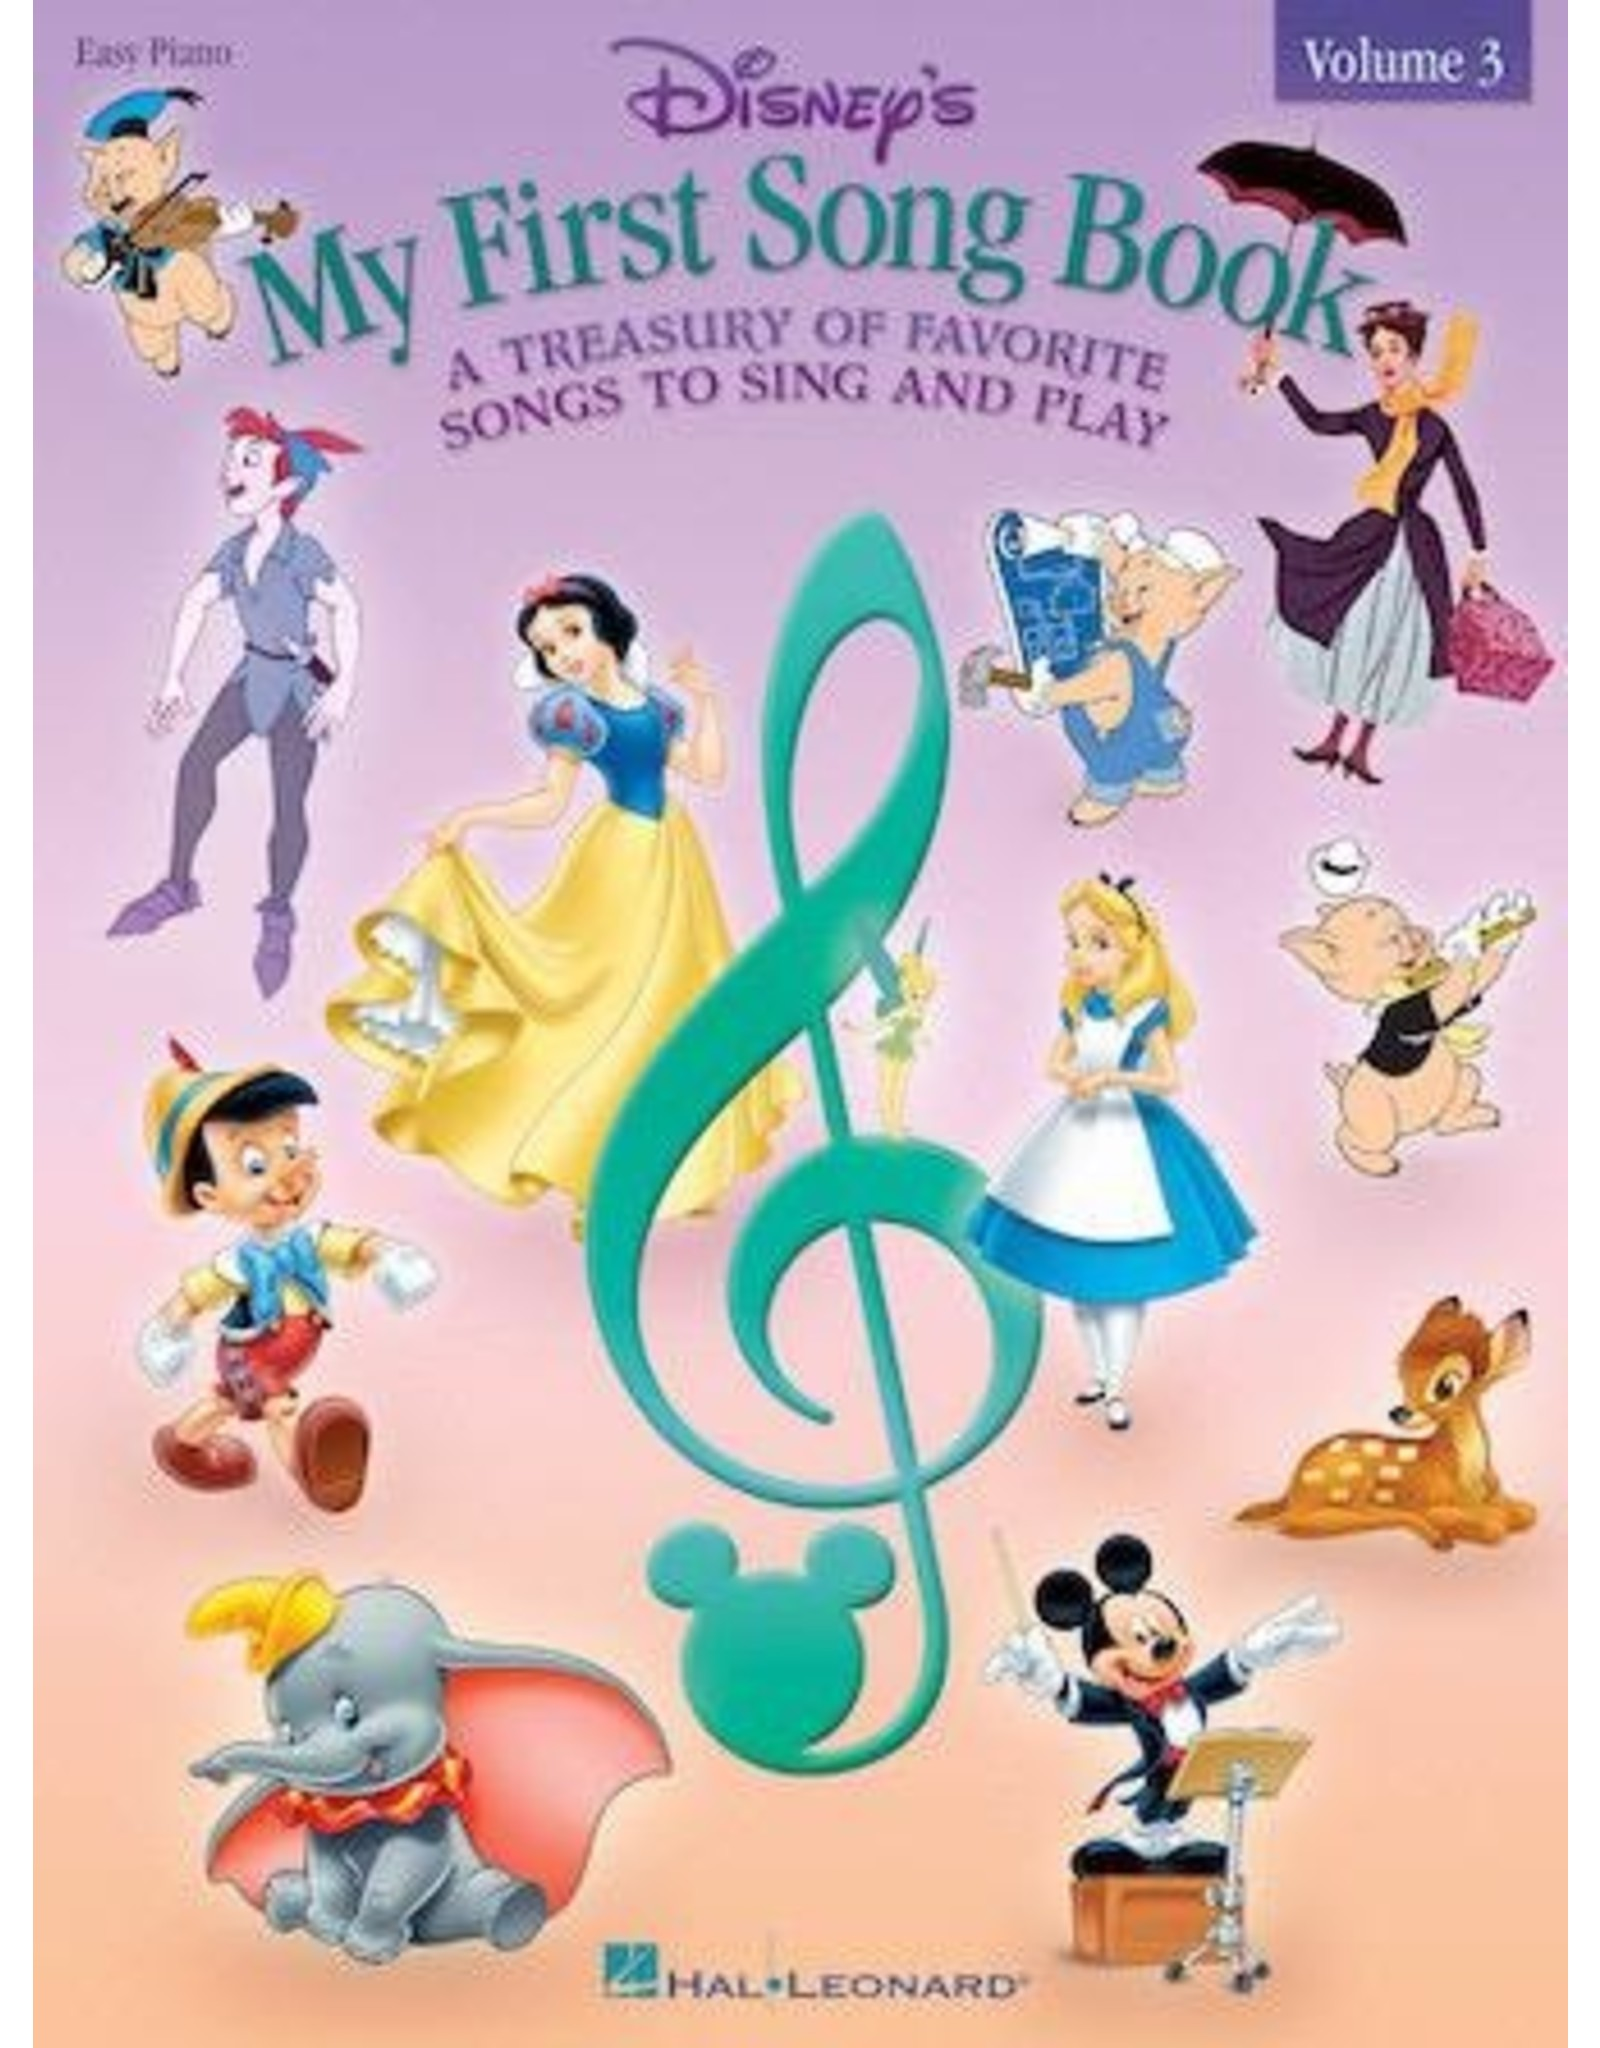 Hal Leonard Disney's My First Songbook Volume 3 Easy Piano